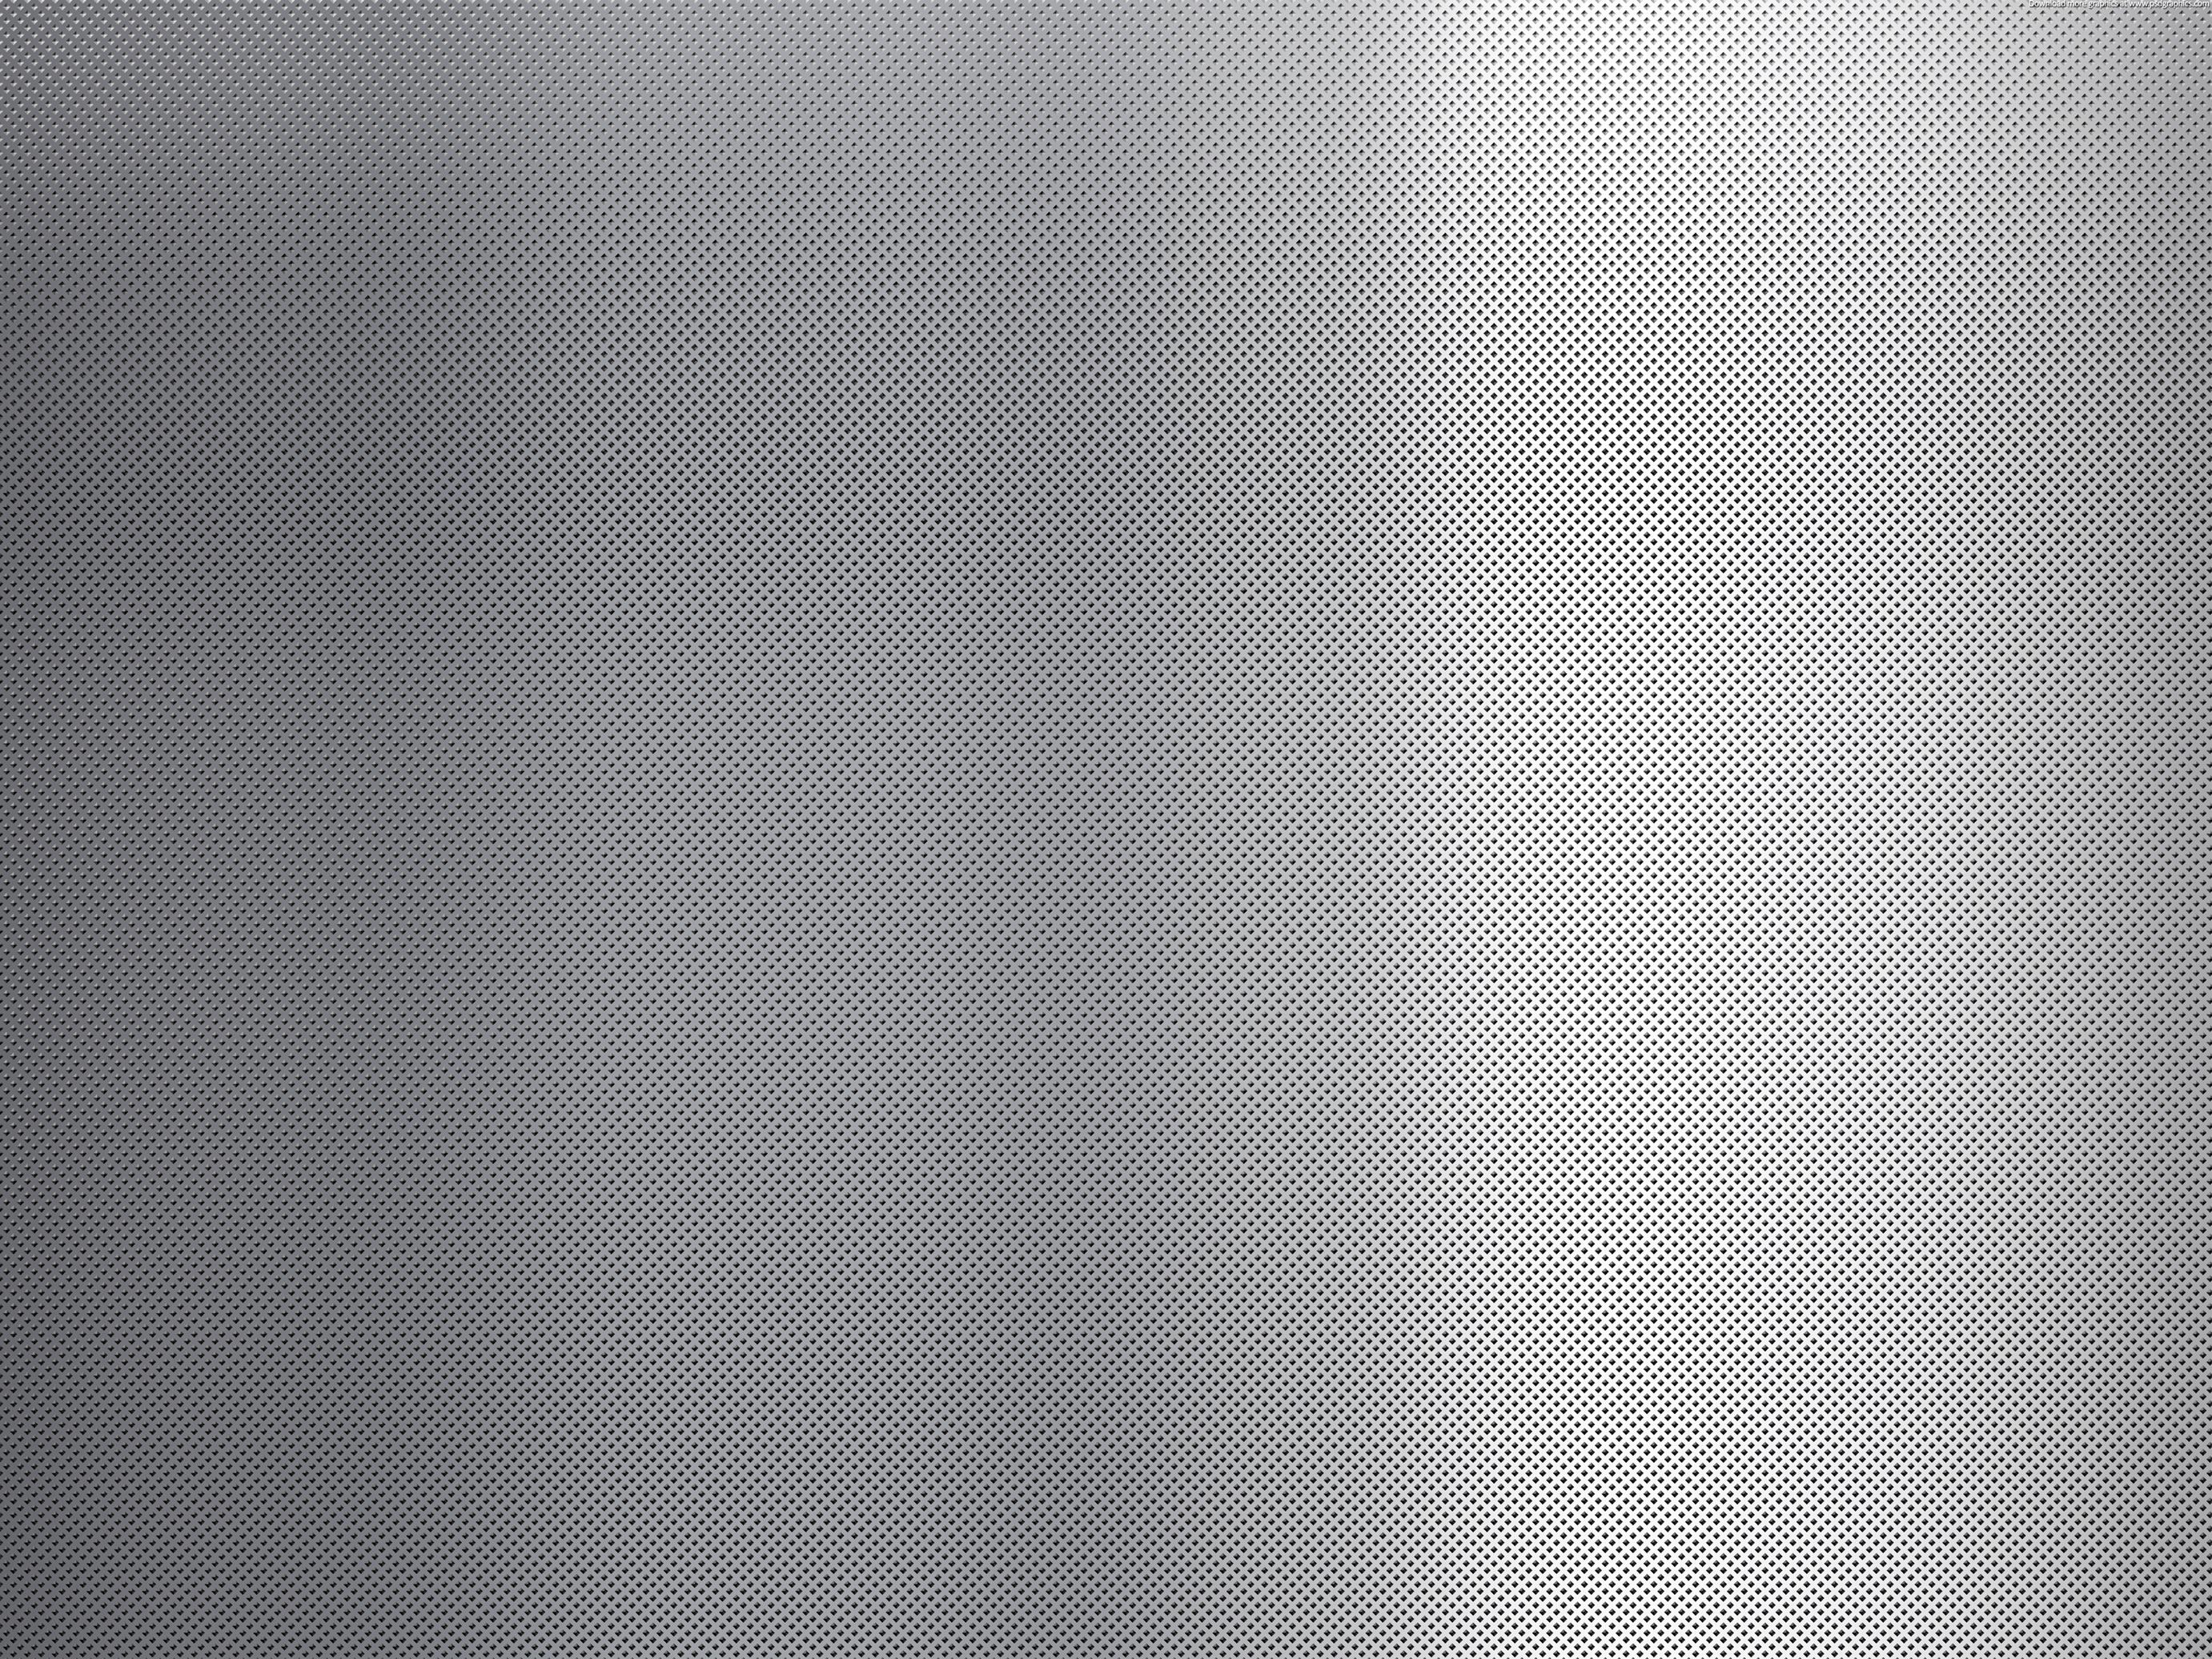 aluminum texture background download aluminum texture background 2763x2072